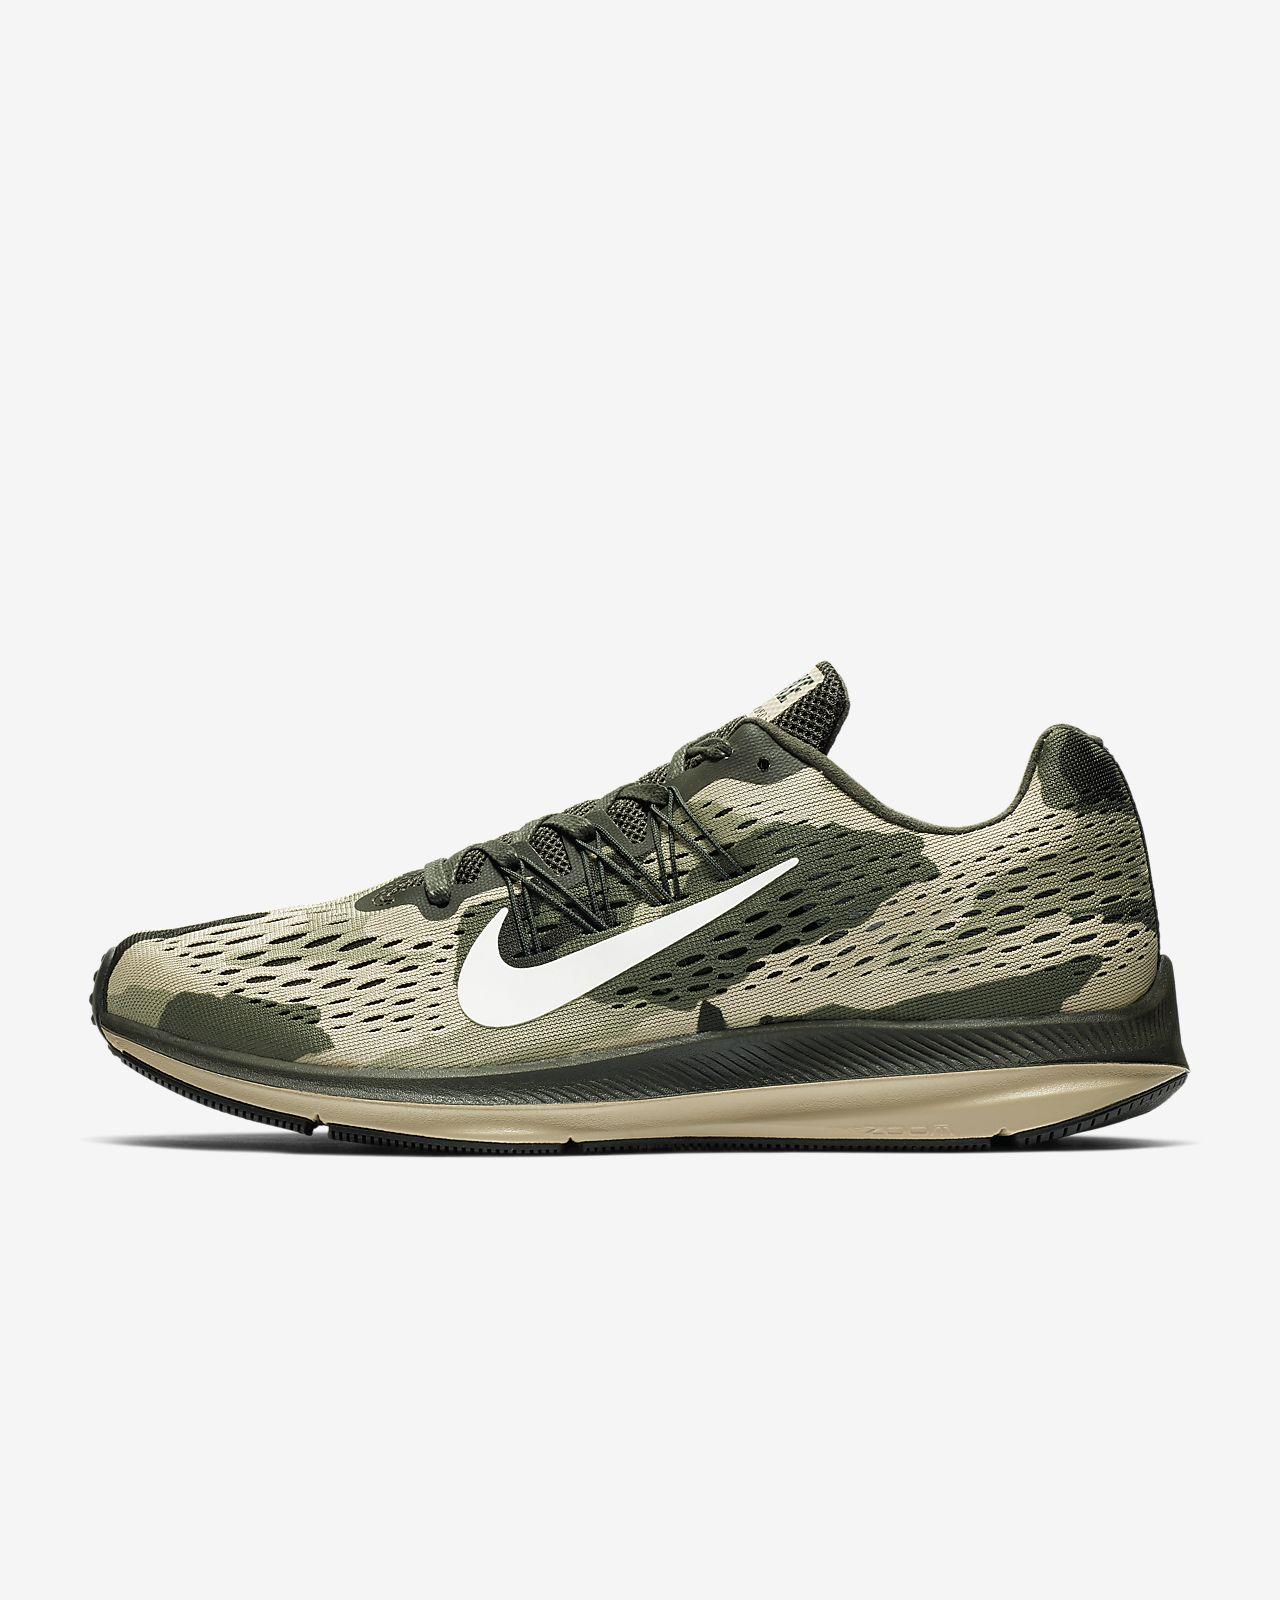 best cheap 8d2f1 f0ff2 ... Nike Air Zoom Winflo 5 Camo Mens Running Shoe